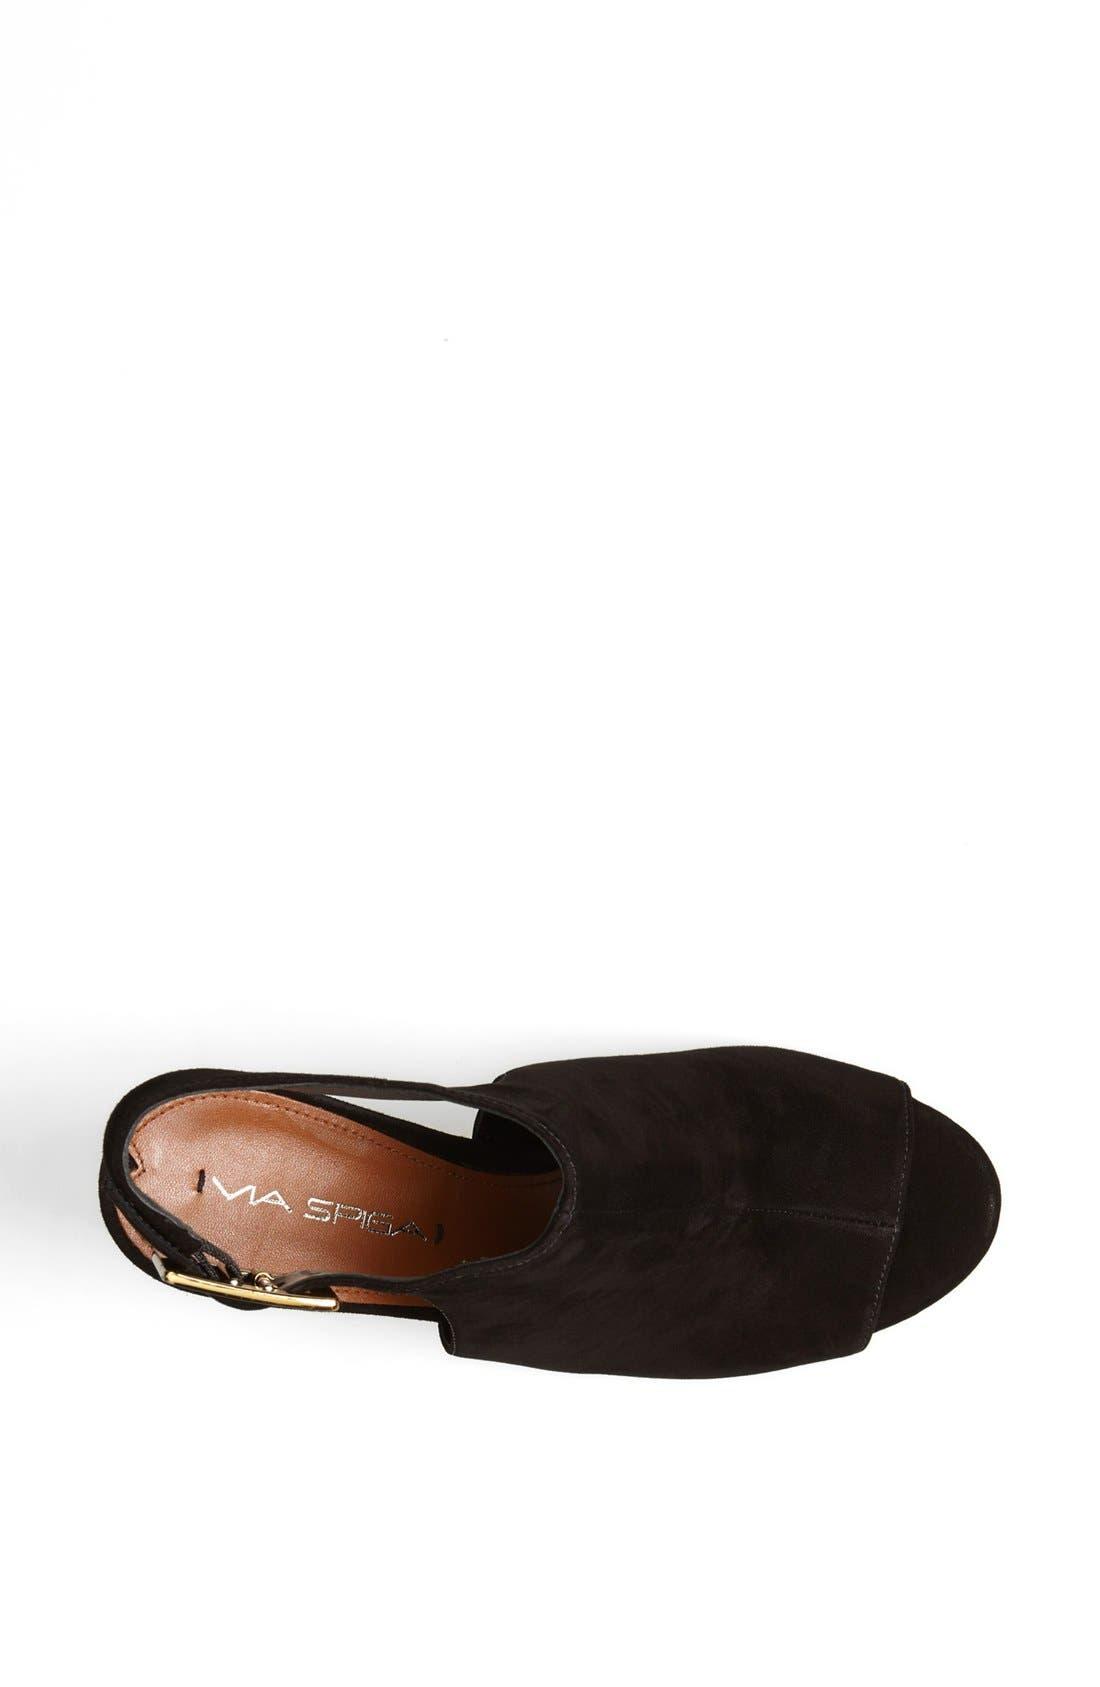 'Nino' Ankle Strap Sandal,                             Alternate thumbnail 3, color,                             002